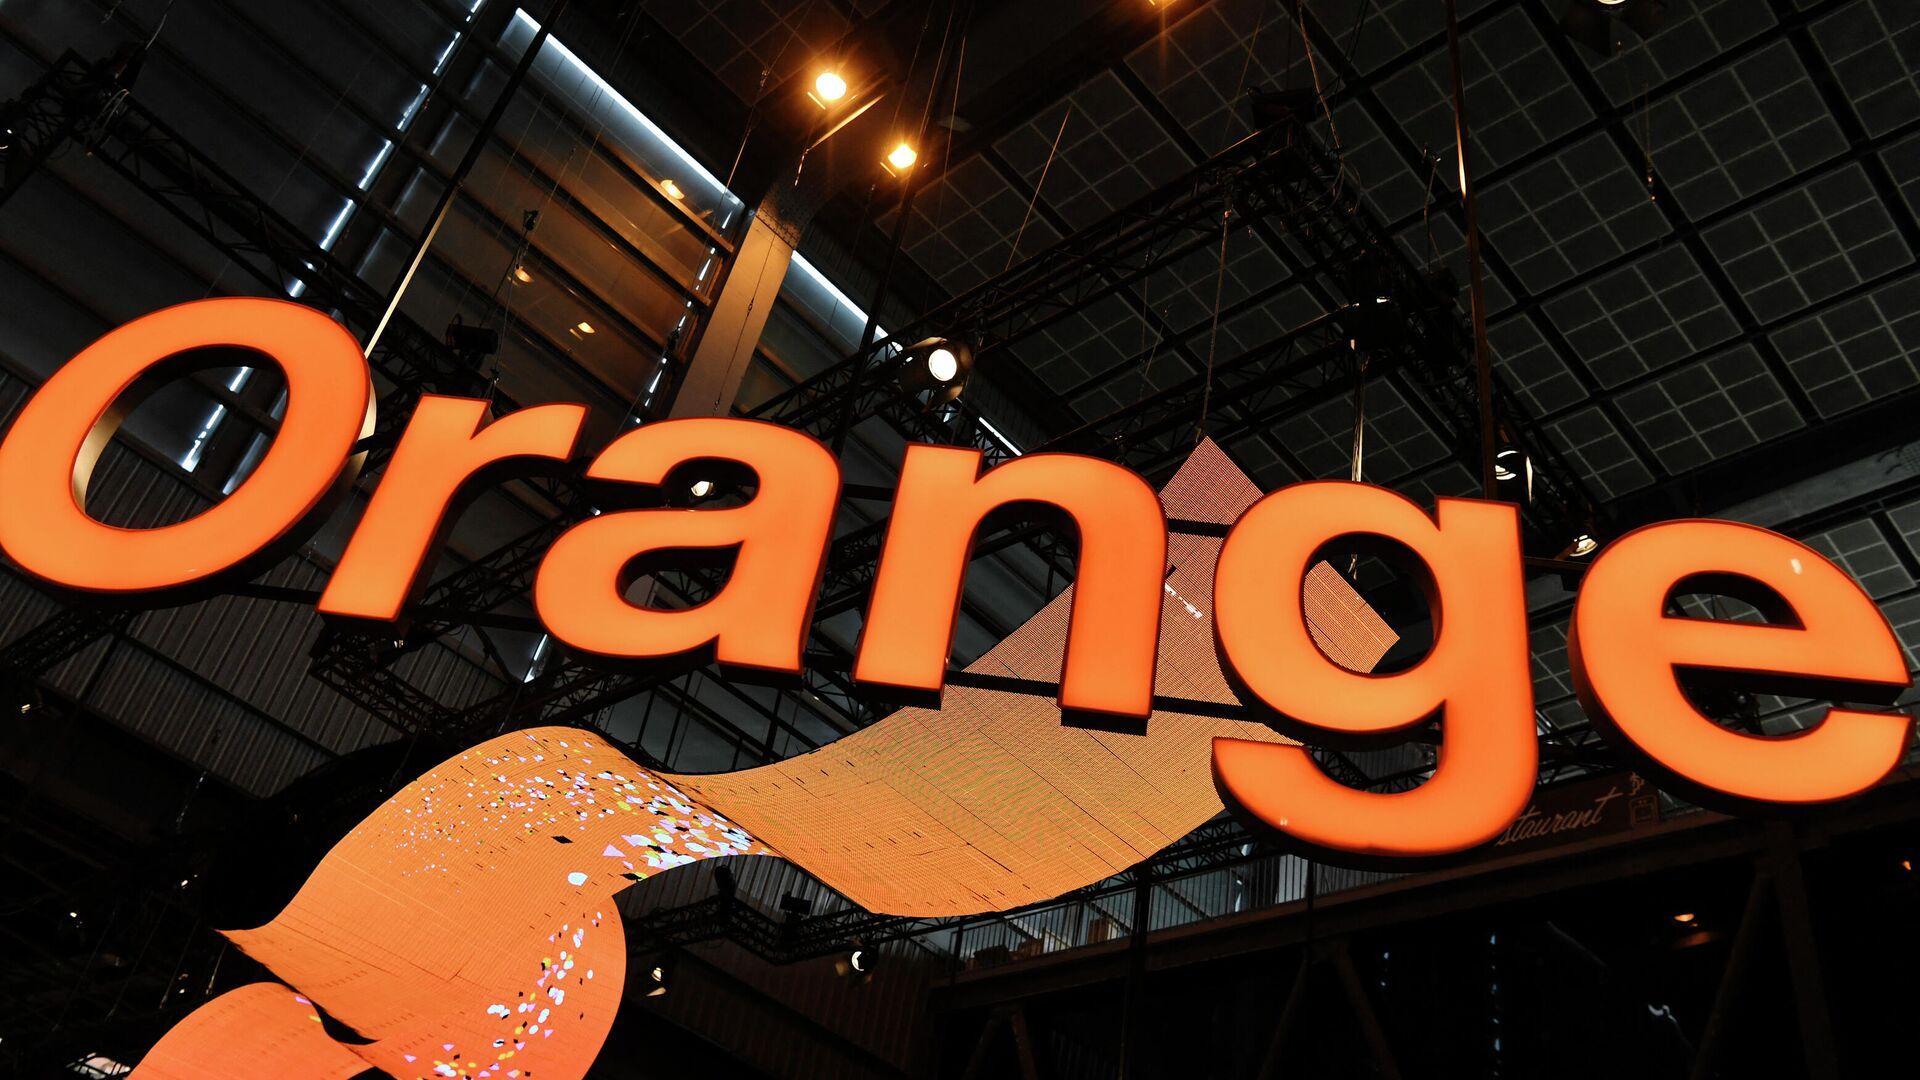 El logo de la empresa de telecomunicaciones Orange - Sputnik Mundo, 1920, 14.05.2021